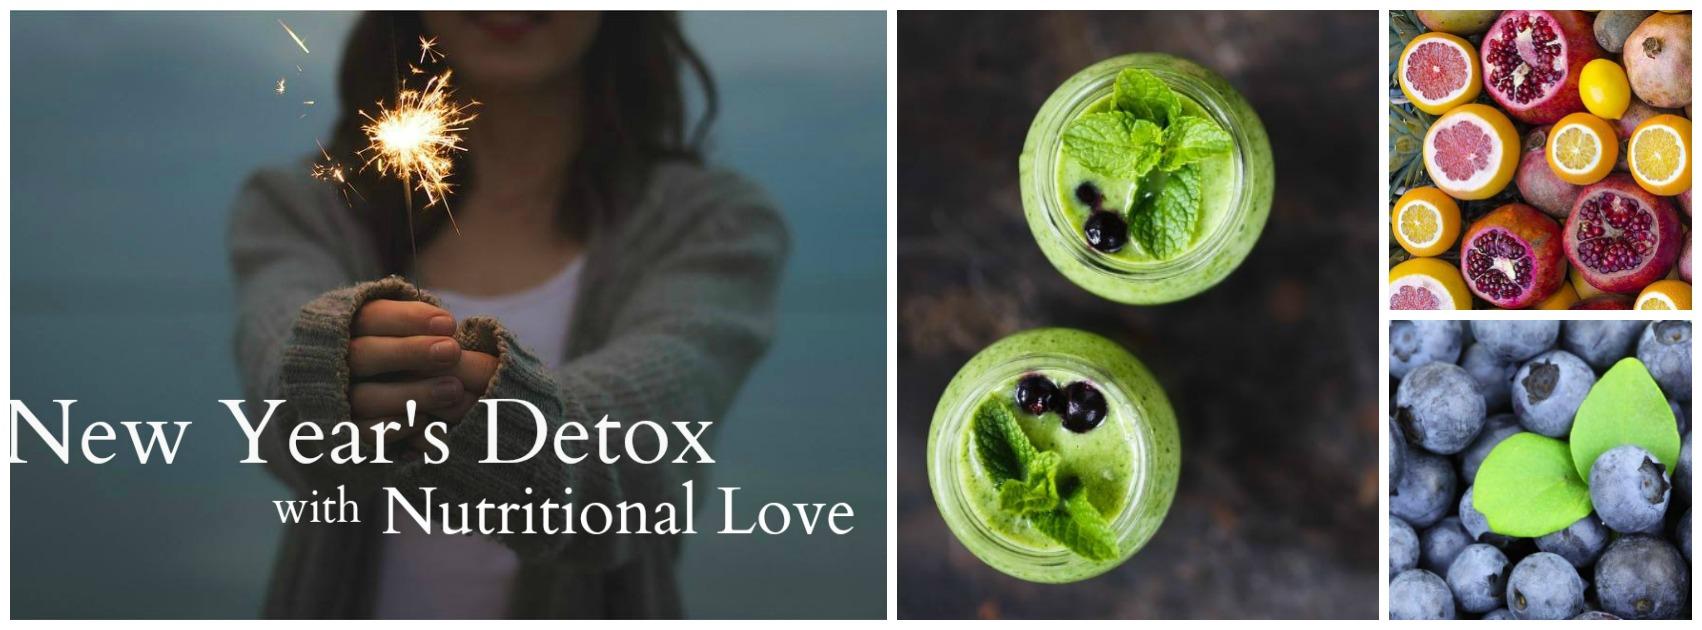 7-Day Nutritional Love Spring Detox Program